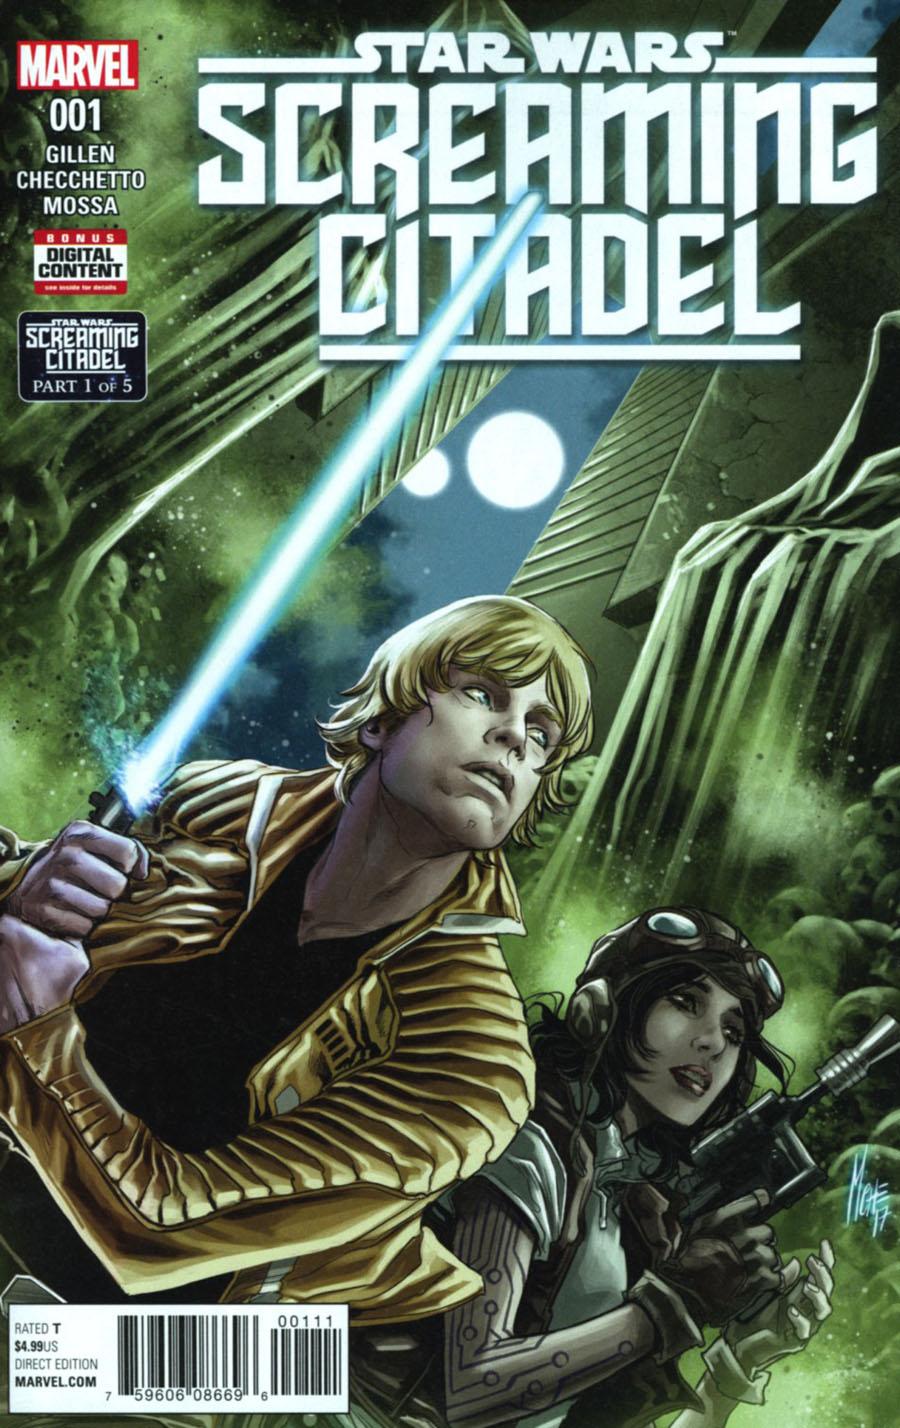 Star Wars Screaming Citadel #1 Cover A Regular Marco Checchetto Cover (Screaming Citadel Part 1)